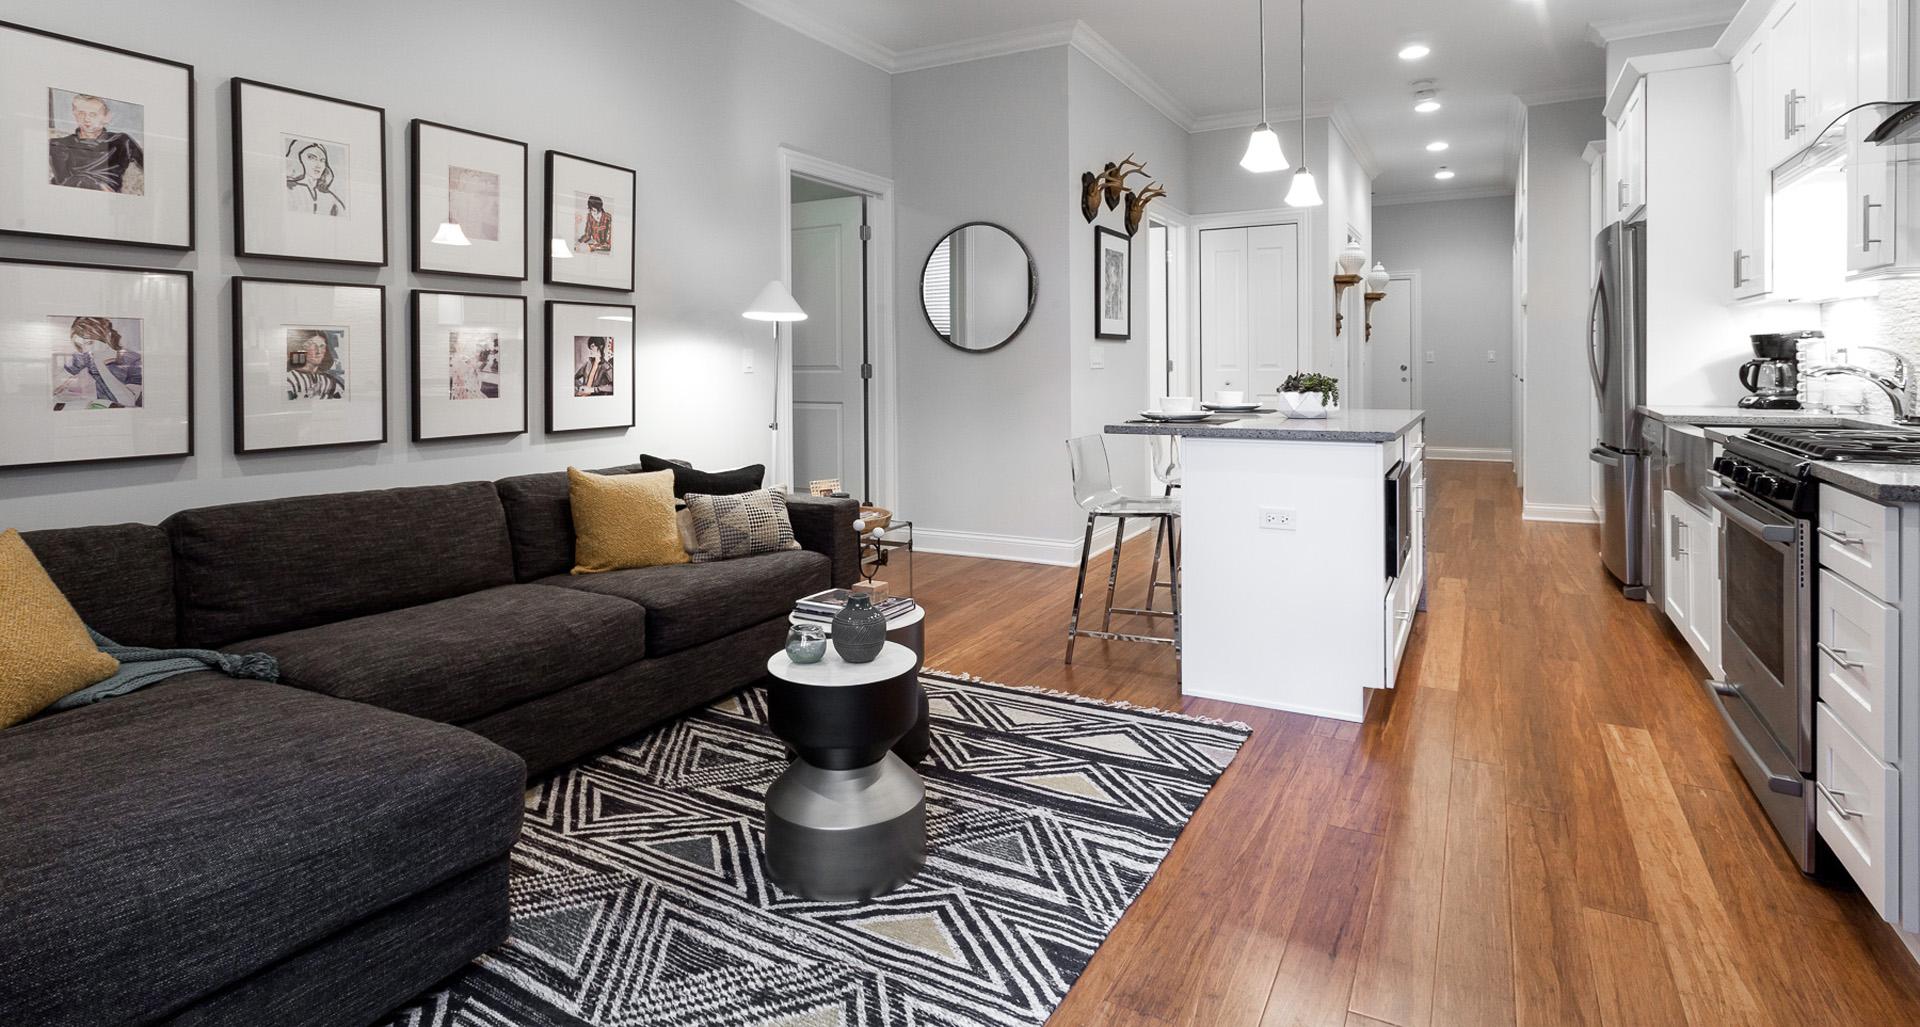 Decorating Ideas For Your Open Concept Condo Chicago Luxury Condos